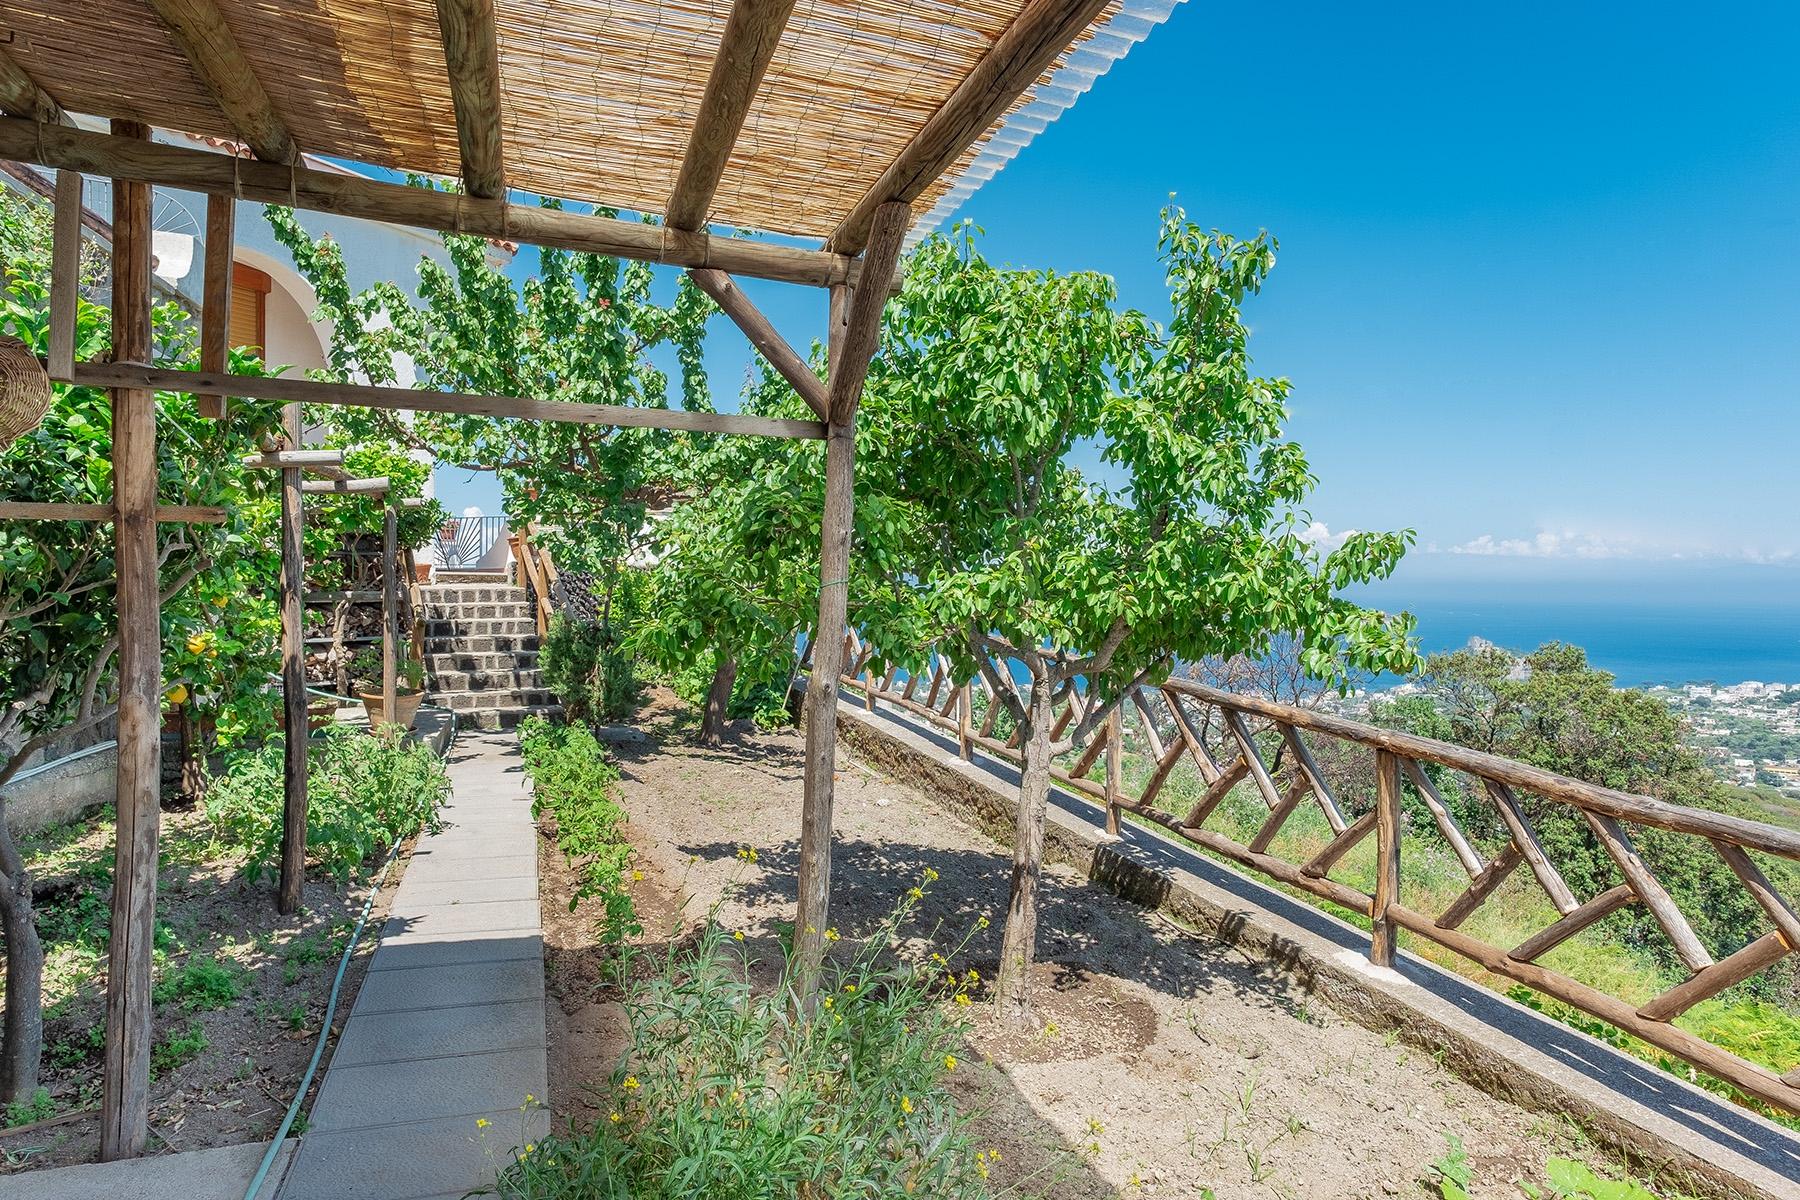 Villa in Vendita a Ischia: 5 locali, 138 mq - Foto 10